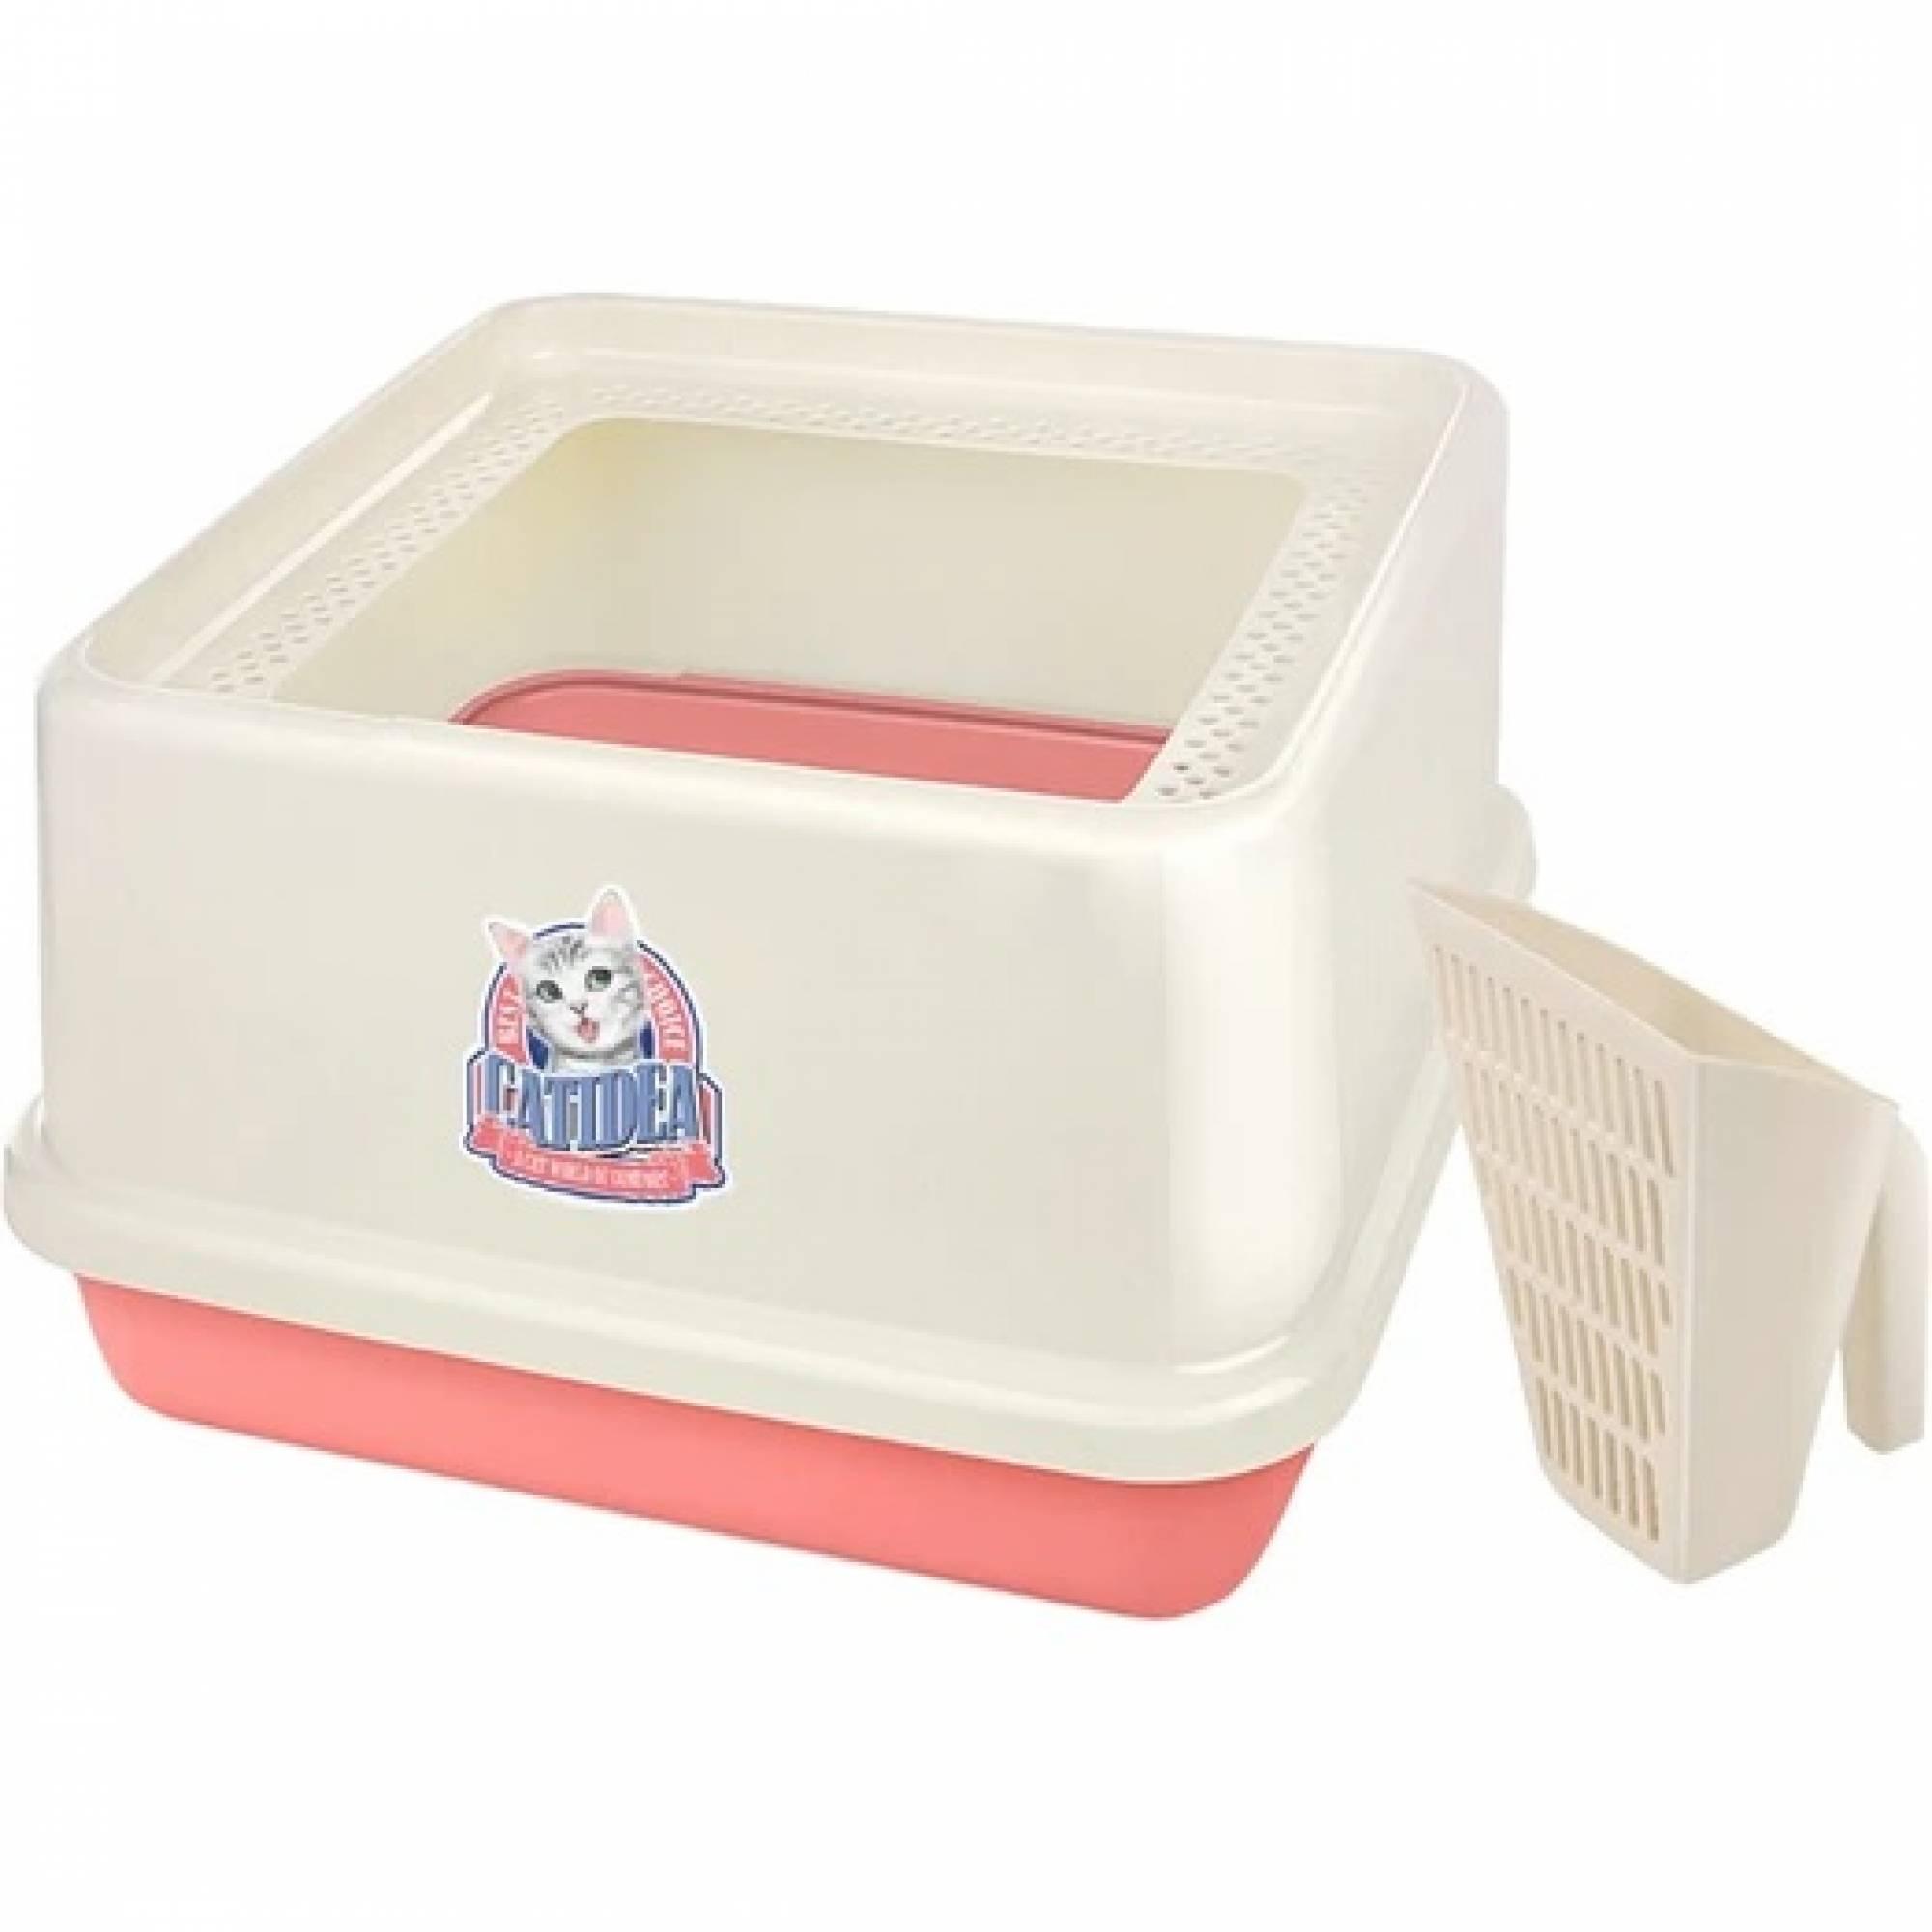 CATIDEA - CL201 Corner Top Entry Cat Litter Box - Pink